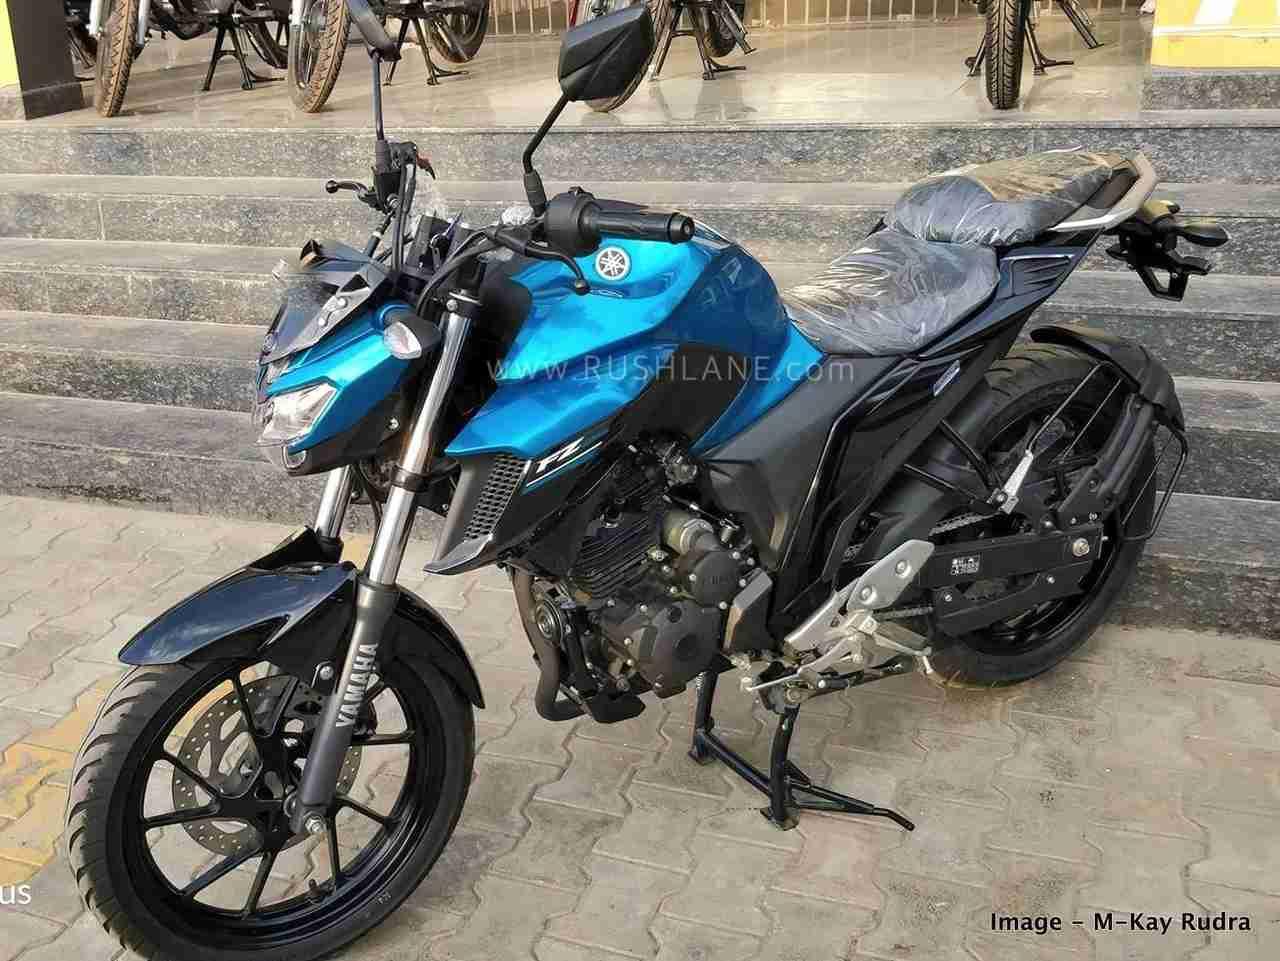 Yamaha FZ25 recall